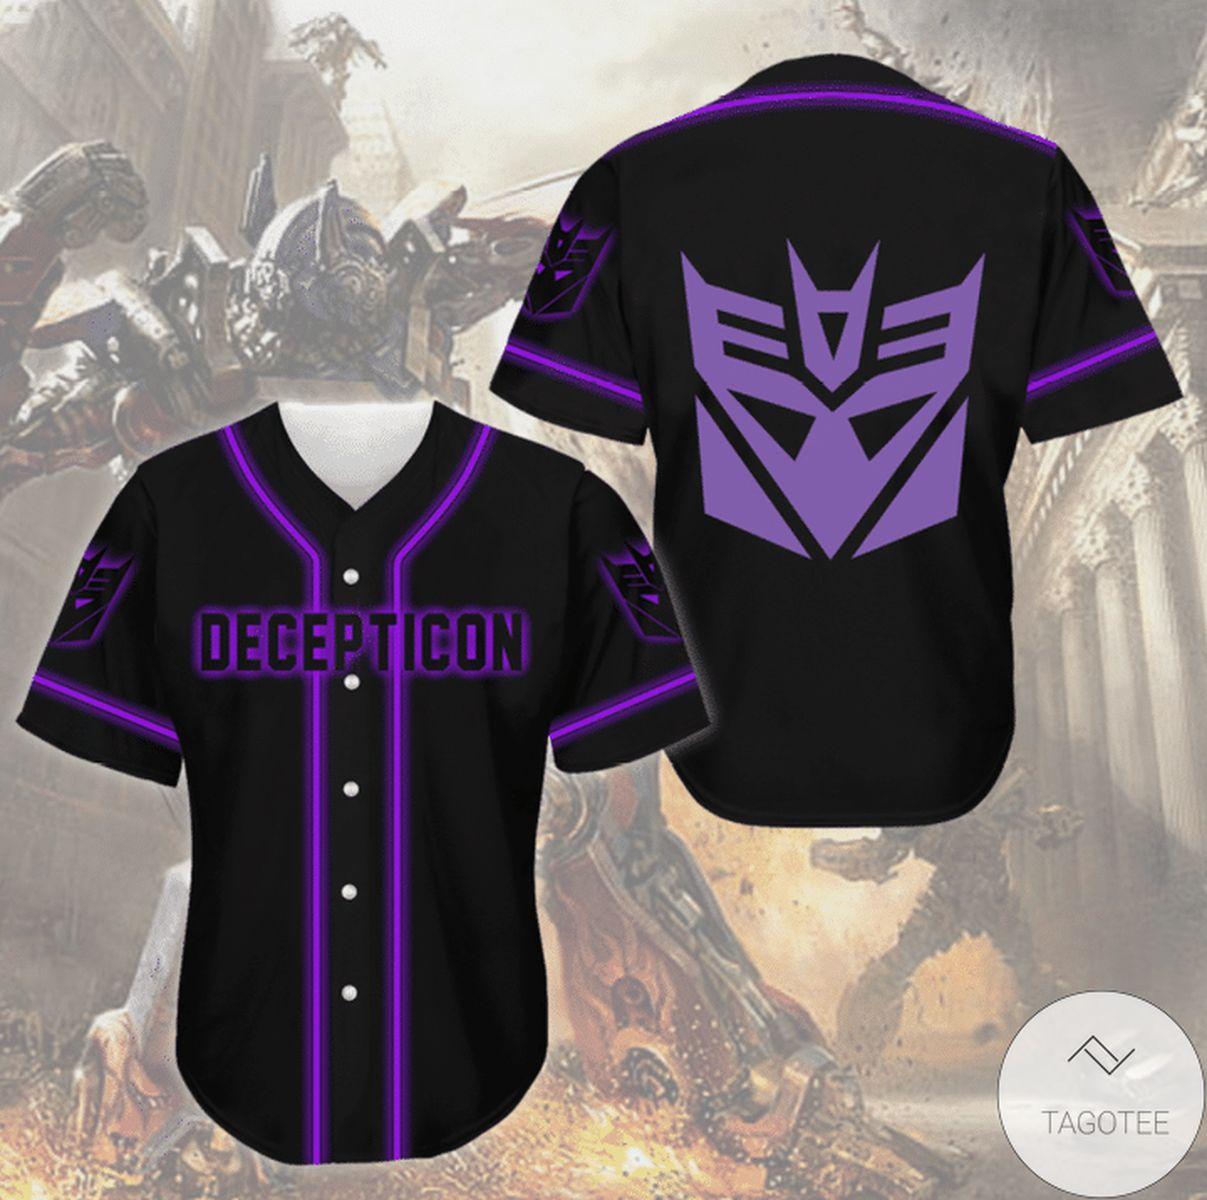 Decepticon Transformer Jersey Baseball Shirt